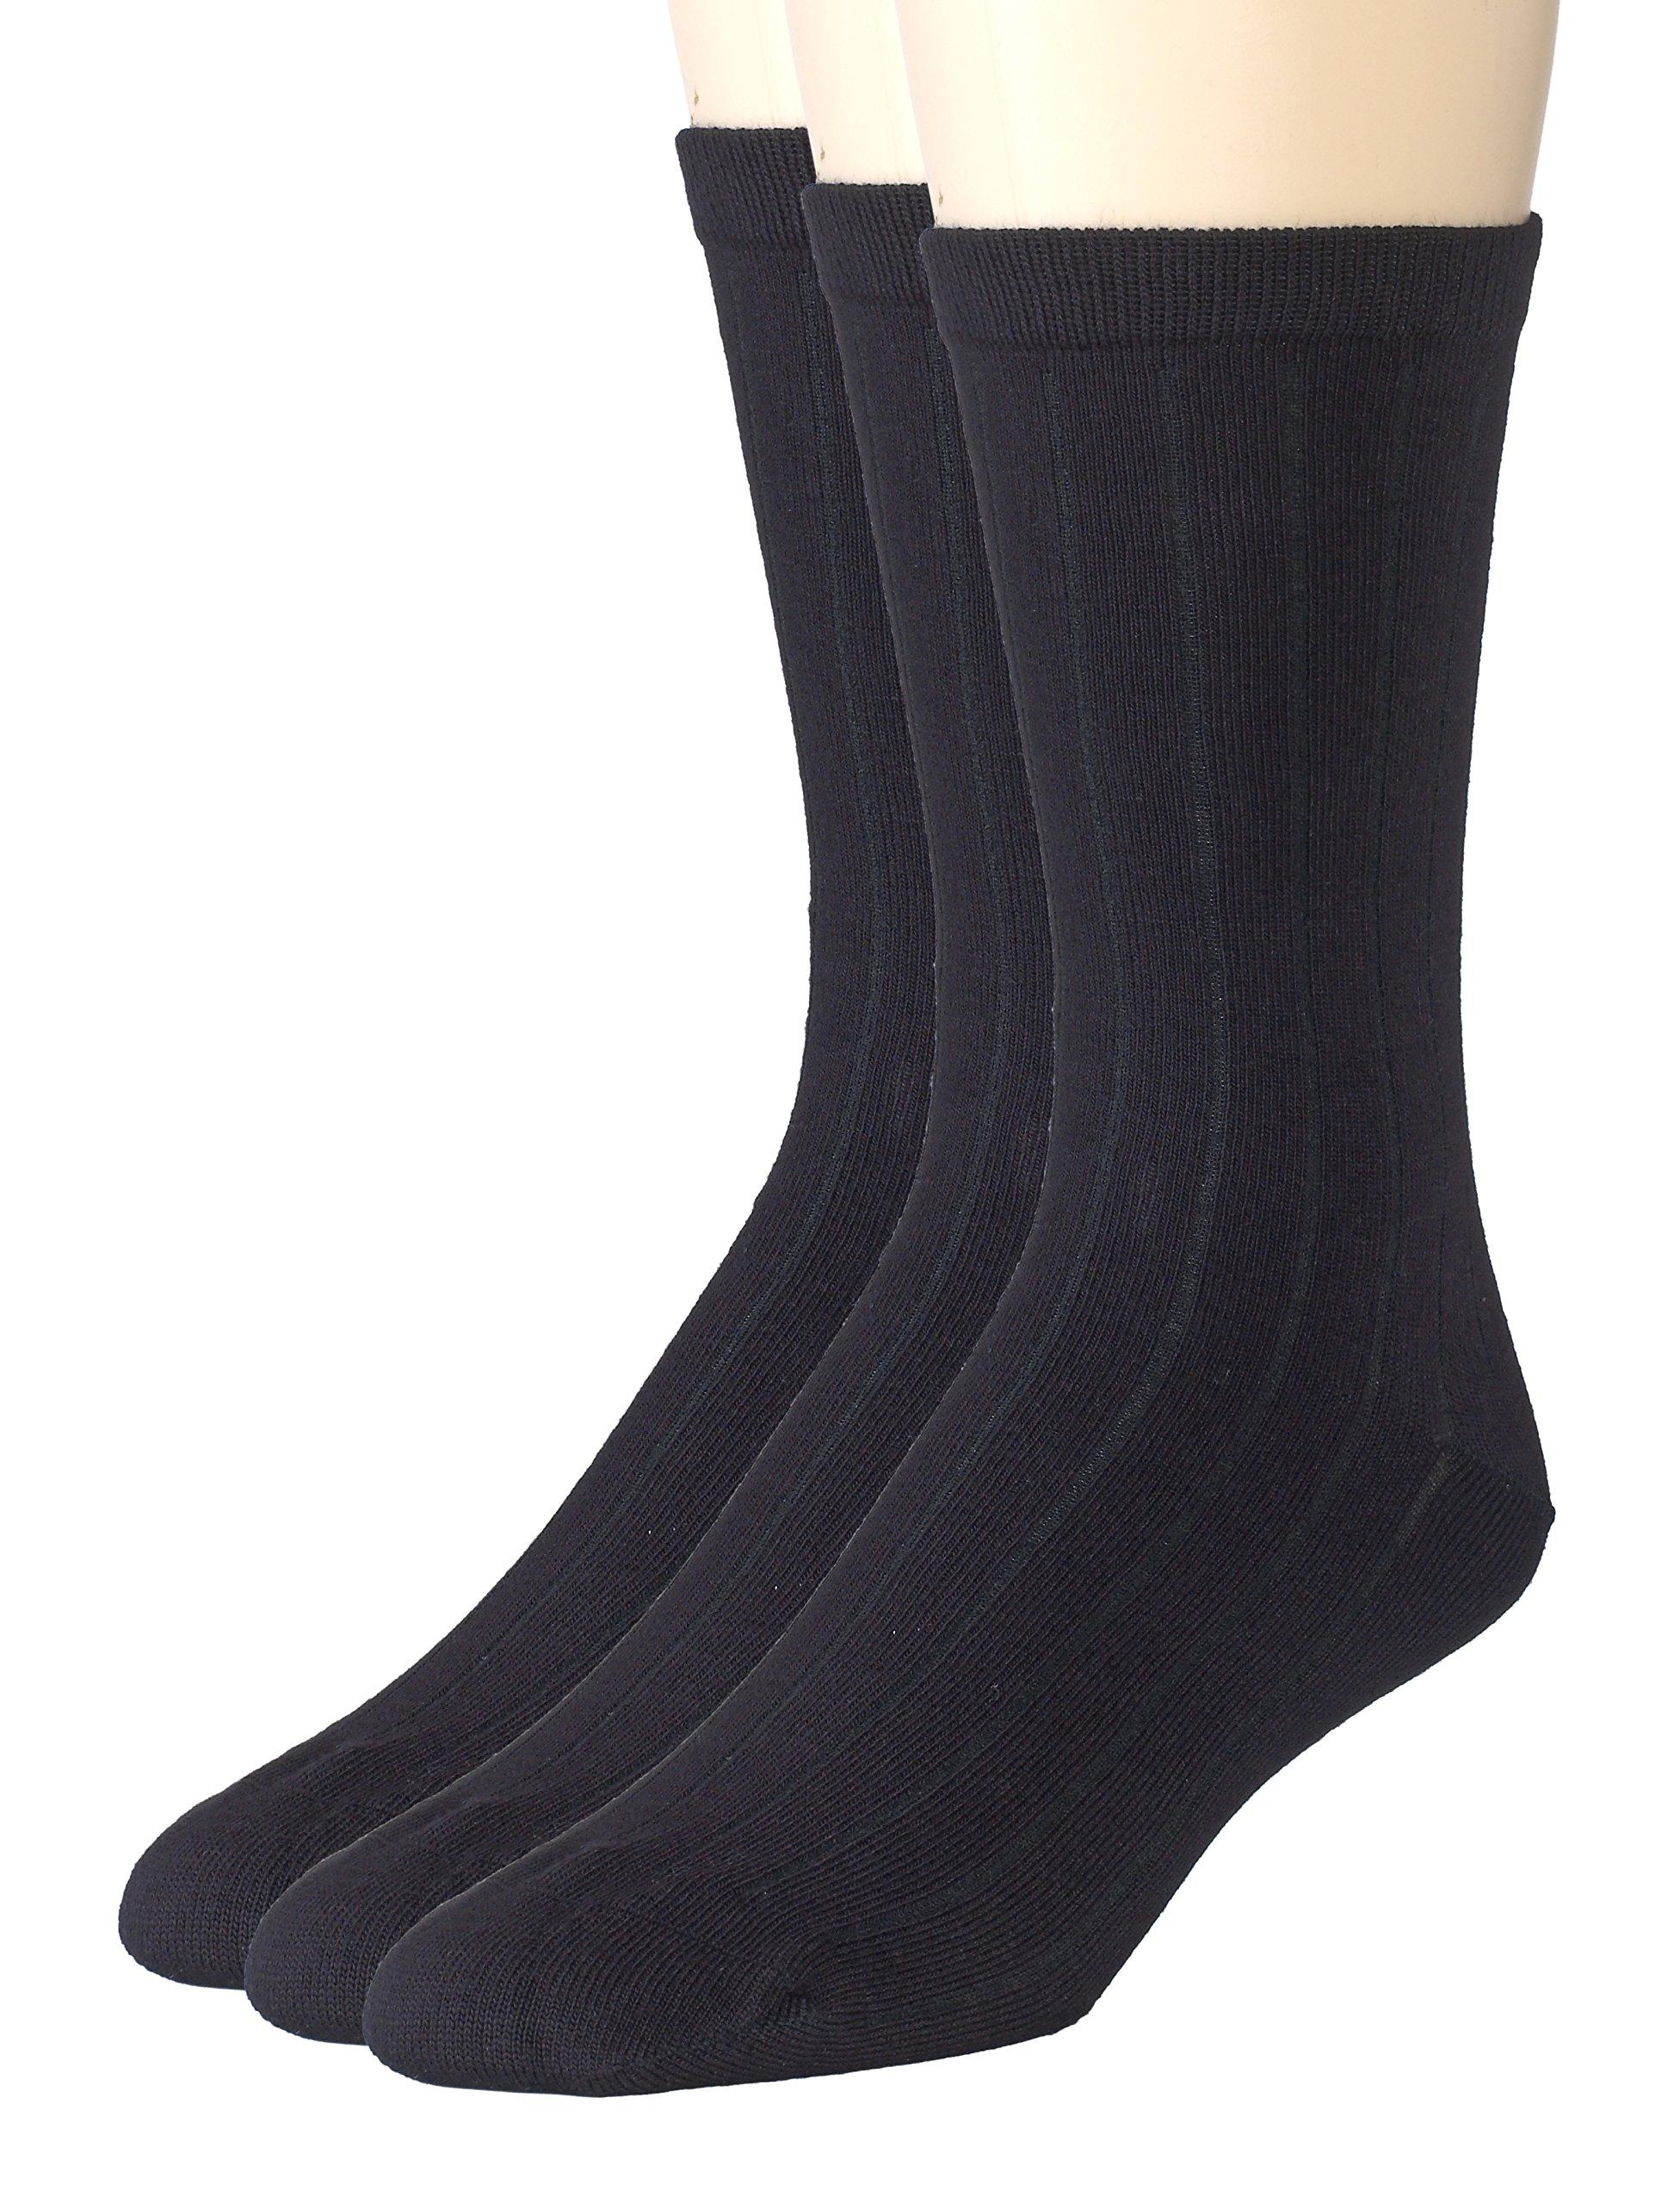 Sportoli Boys' Super Soft Ribbed Classic Cotton Bamboo Crew Casual Uniform Dress Socks (Pack of 3) - Black (8-9)